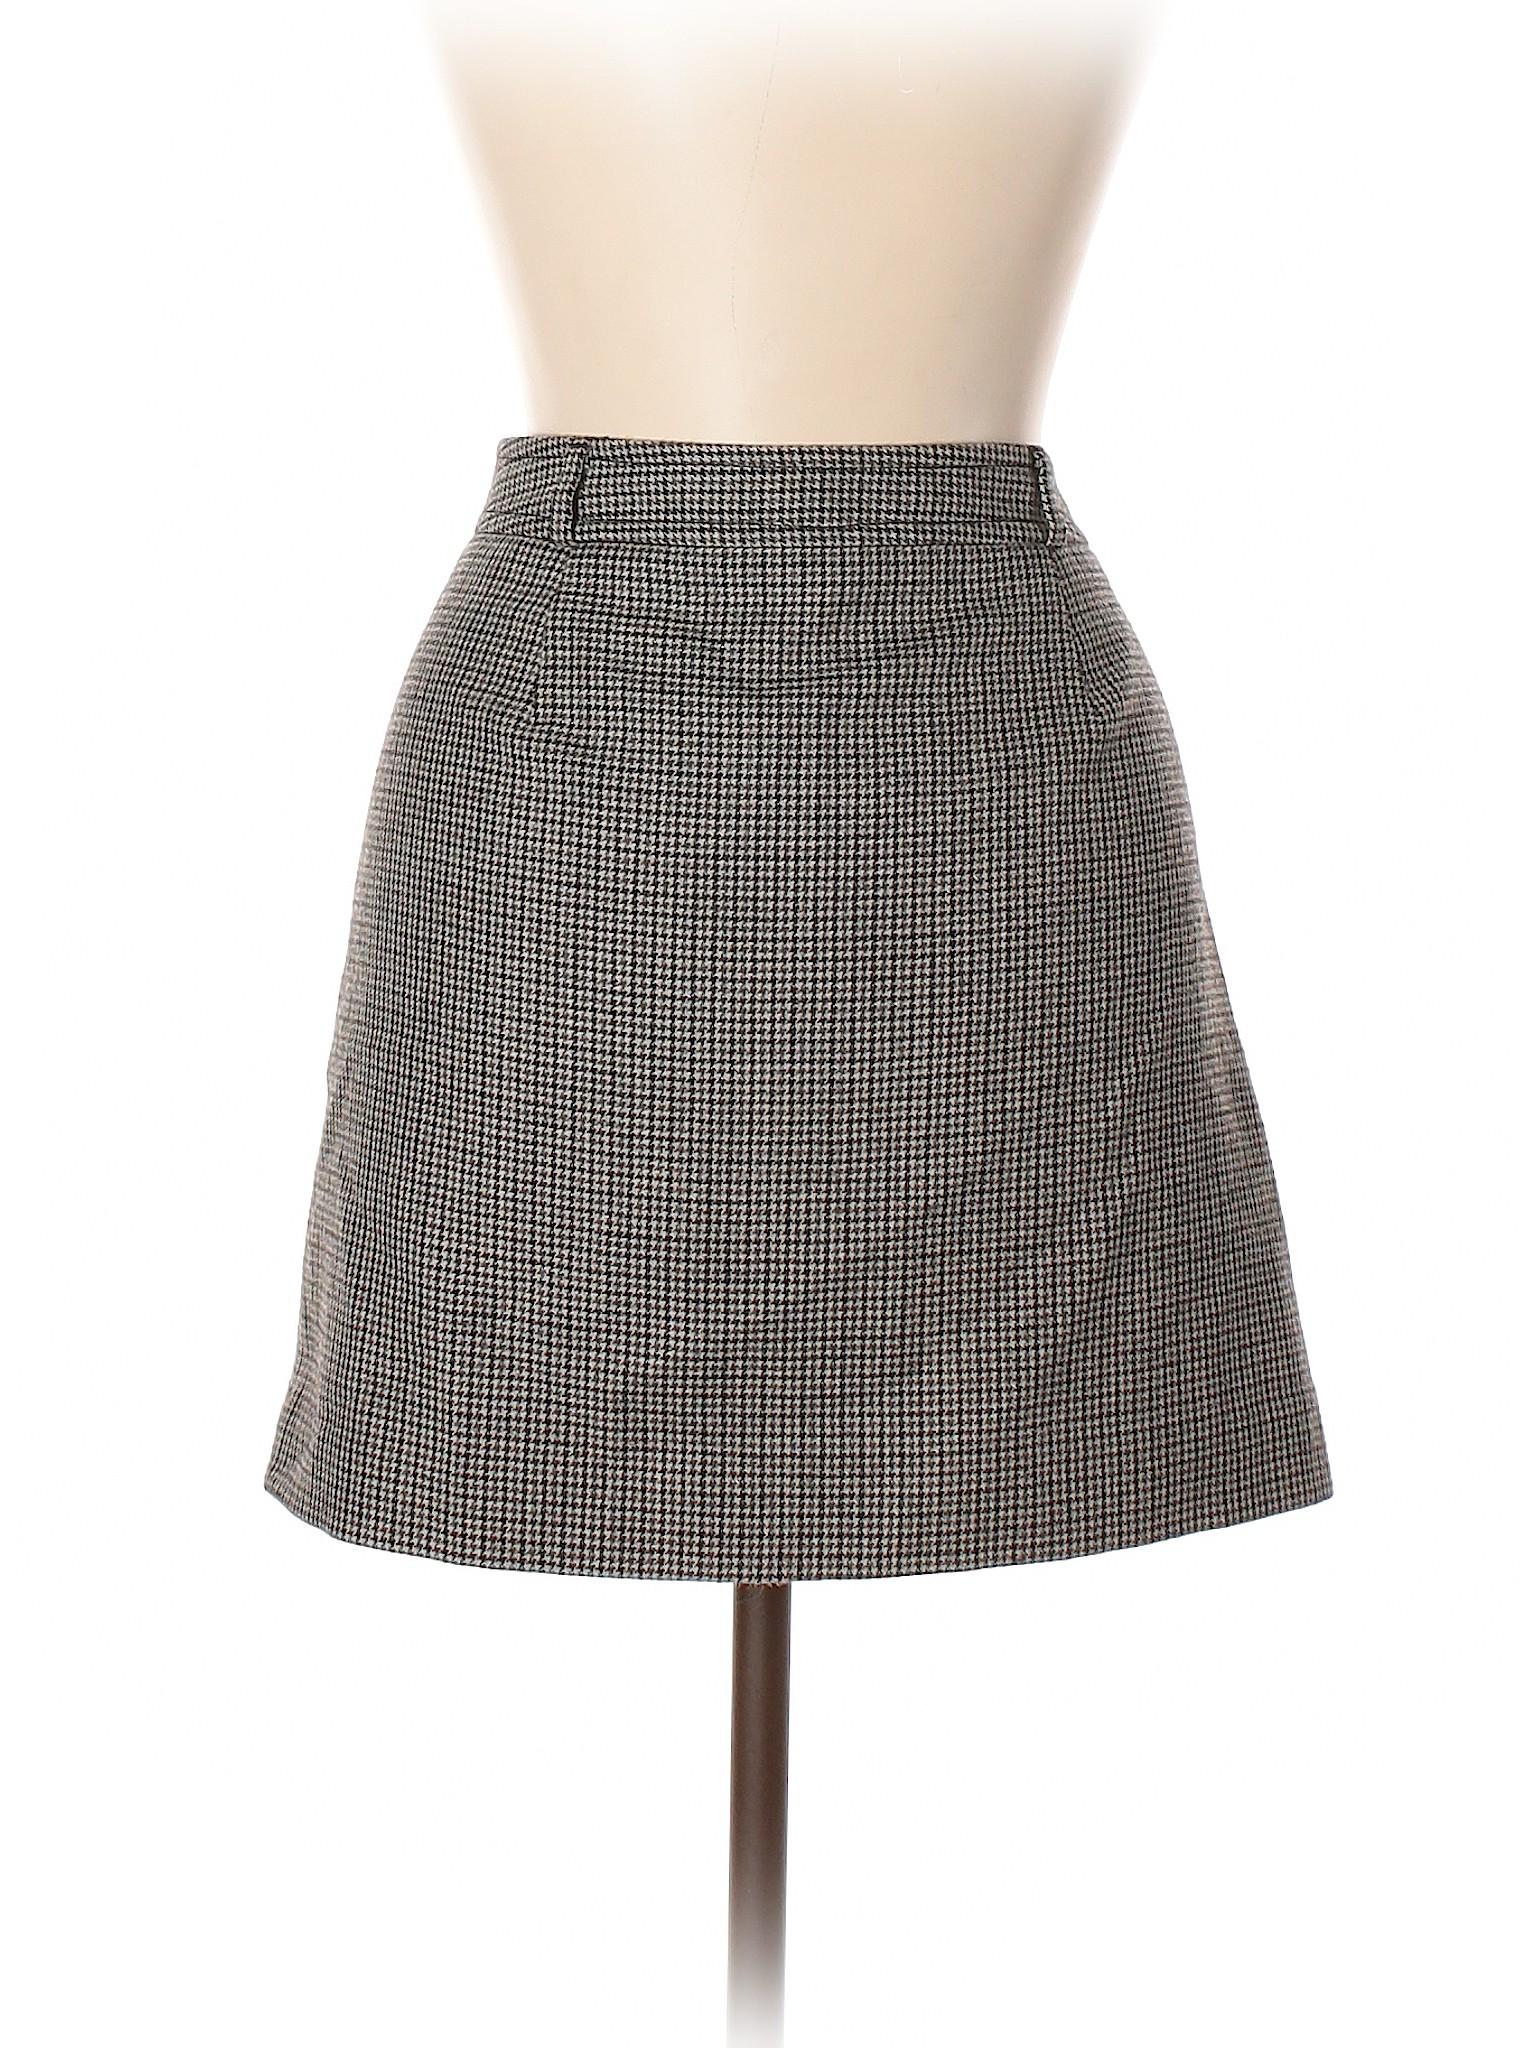 Banana Wool Leisure Skirt Republic winter 5tSfg